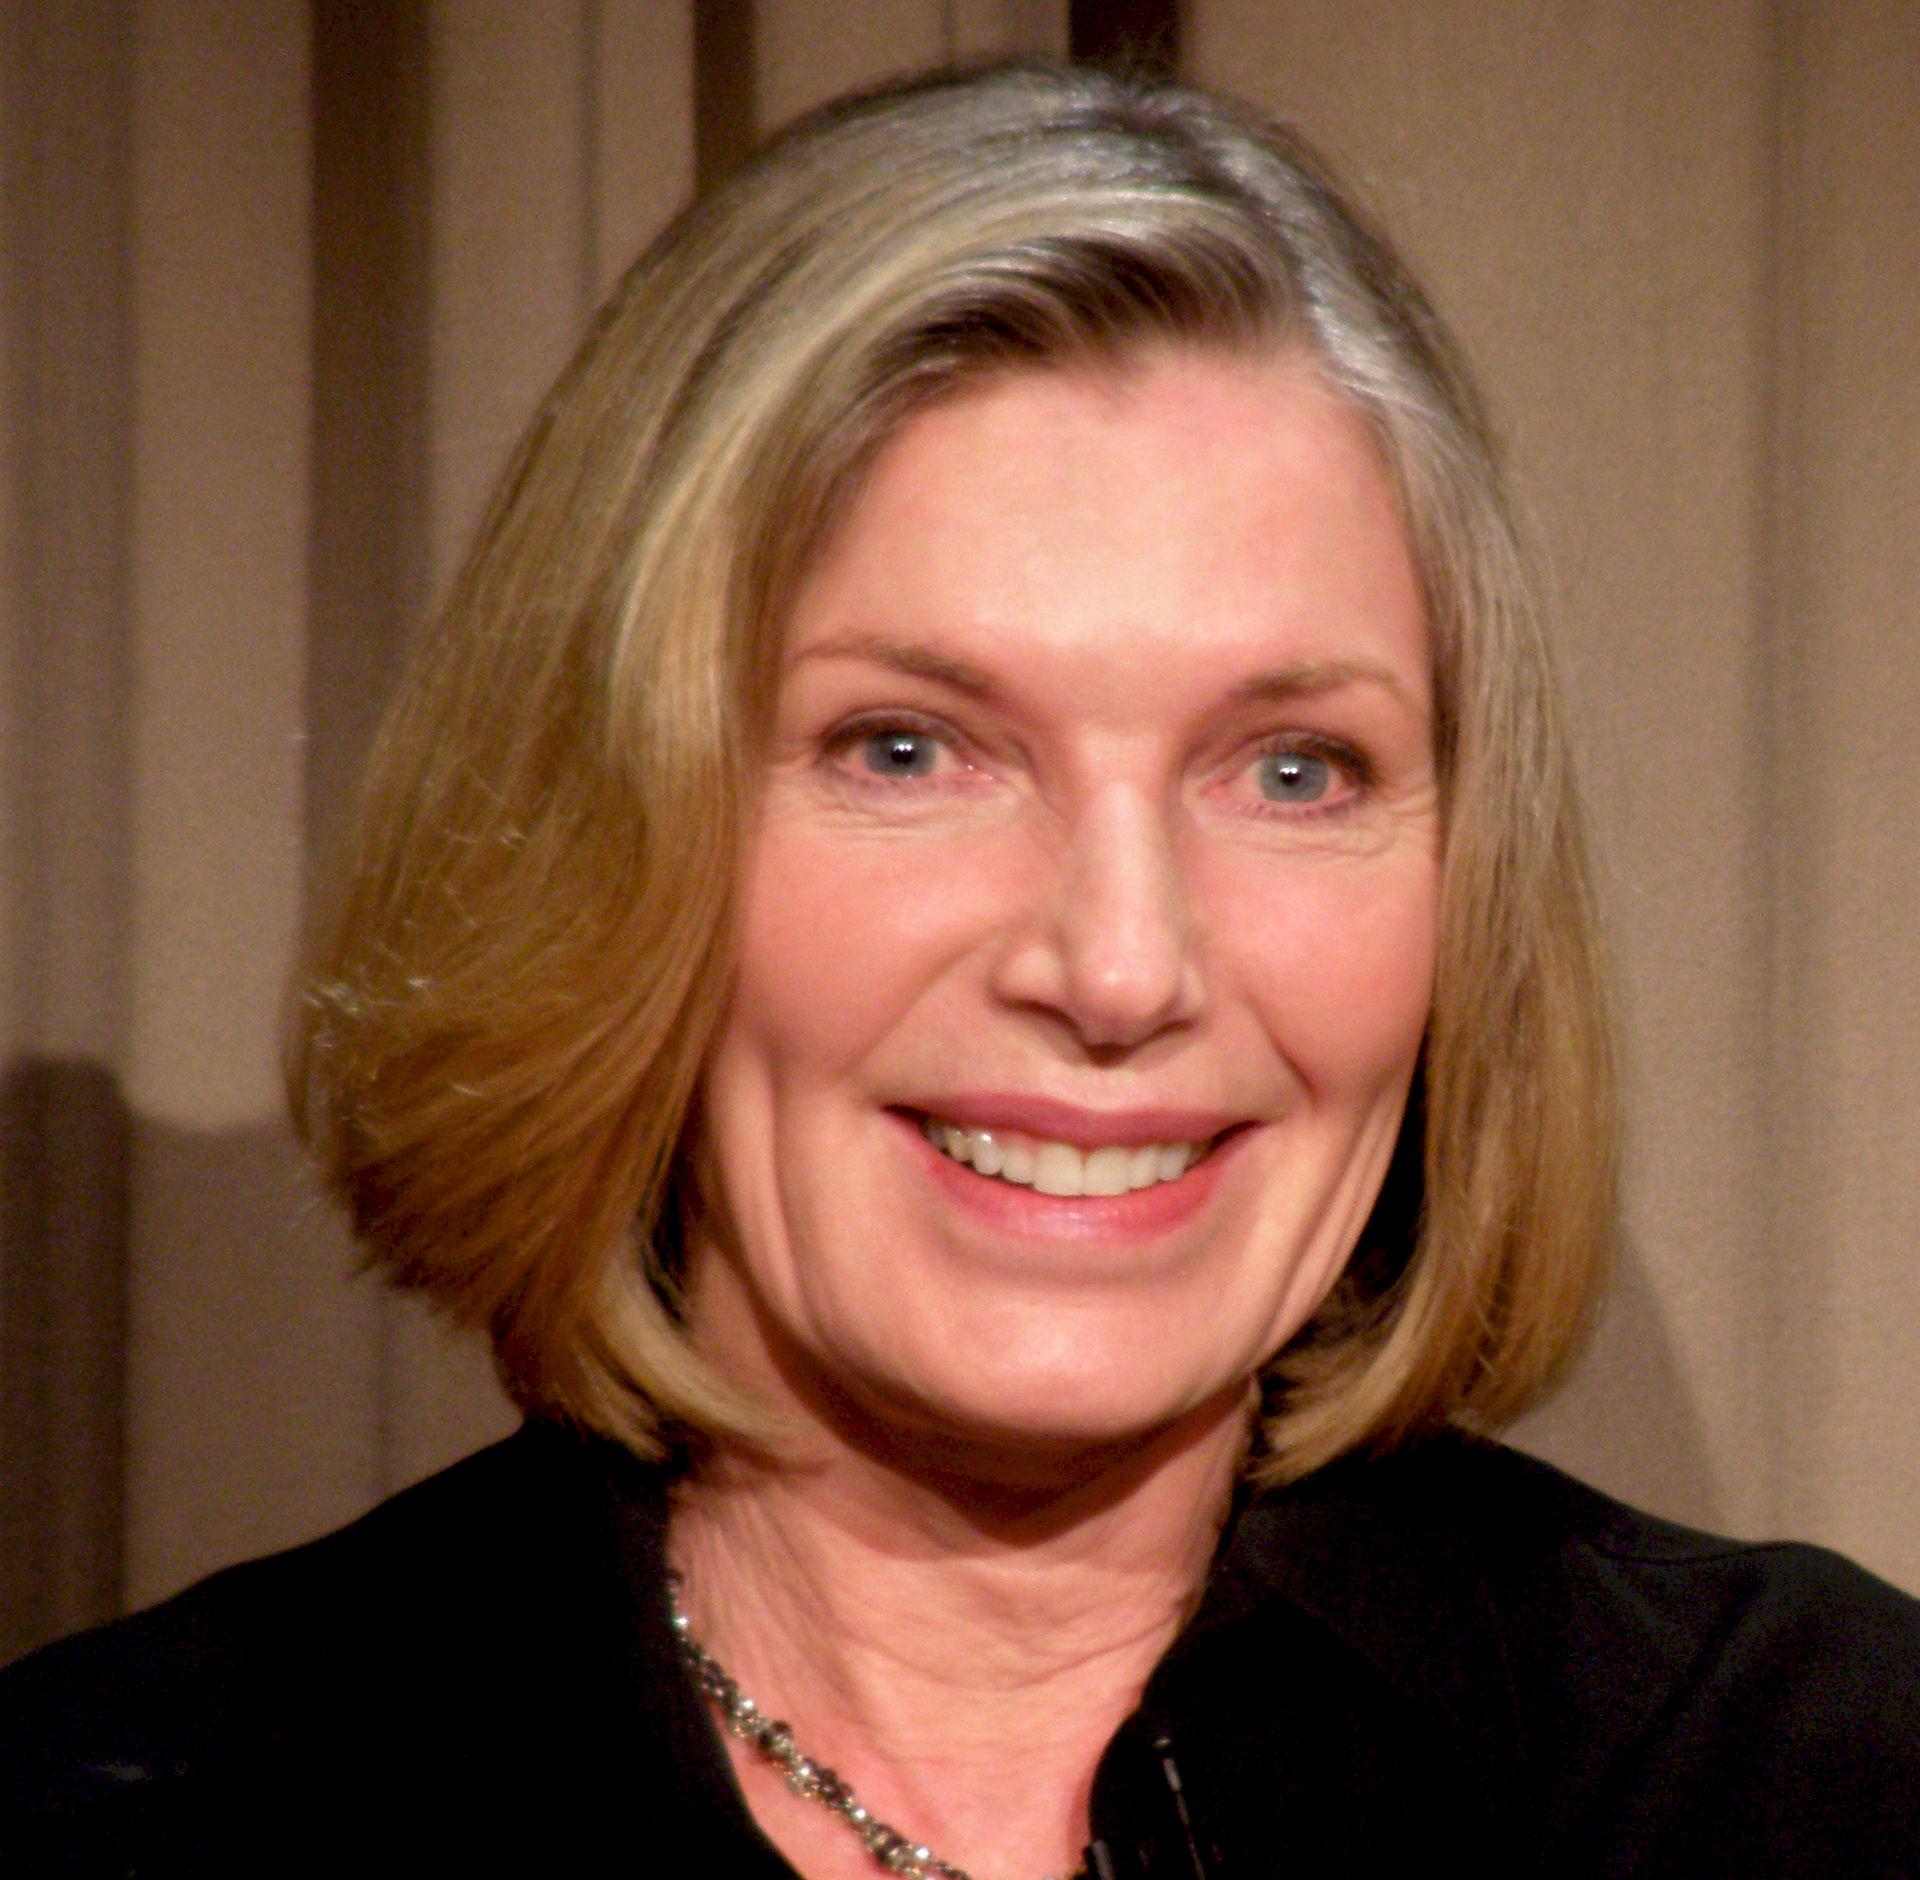 Photo of Susan Sullivan: Actress